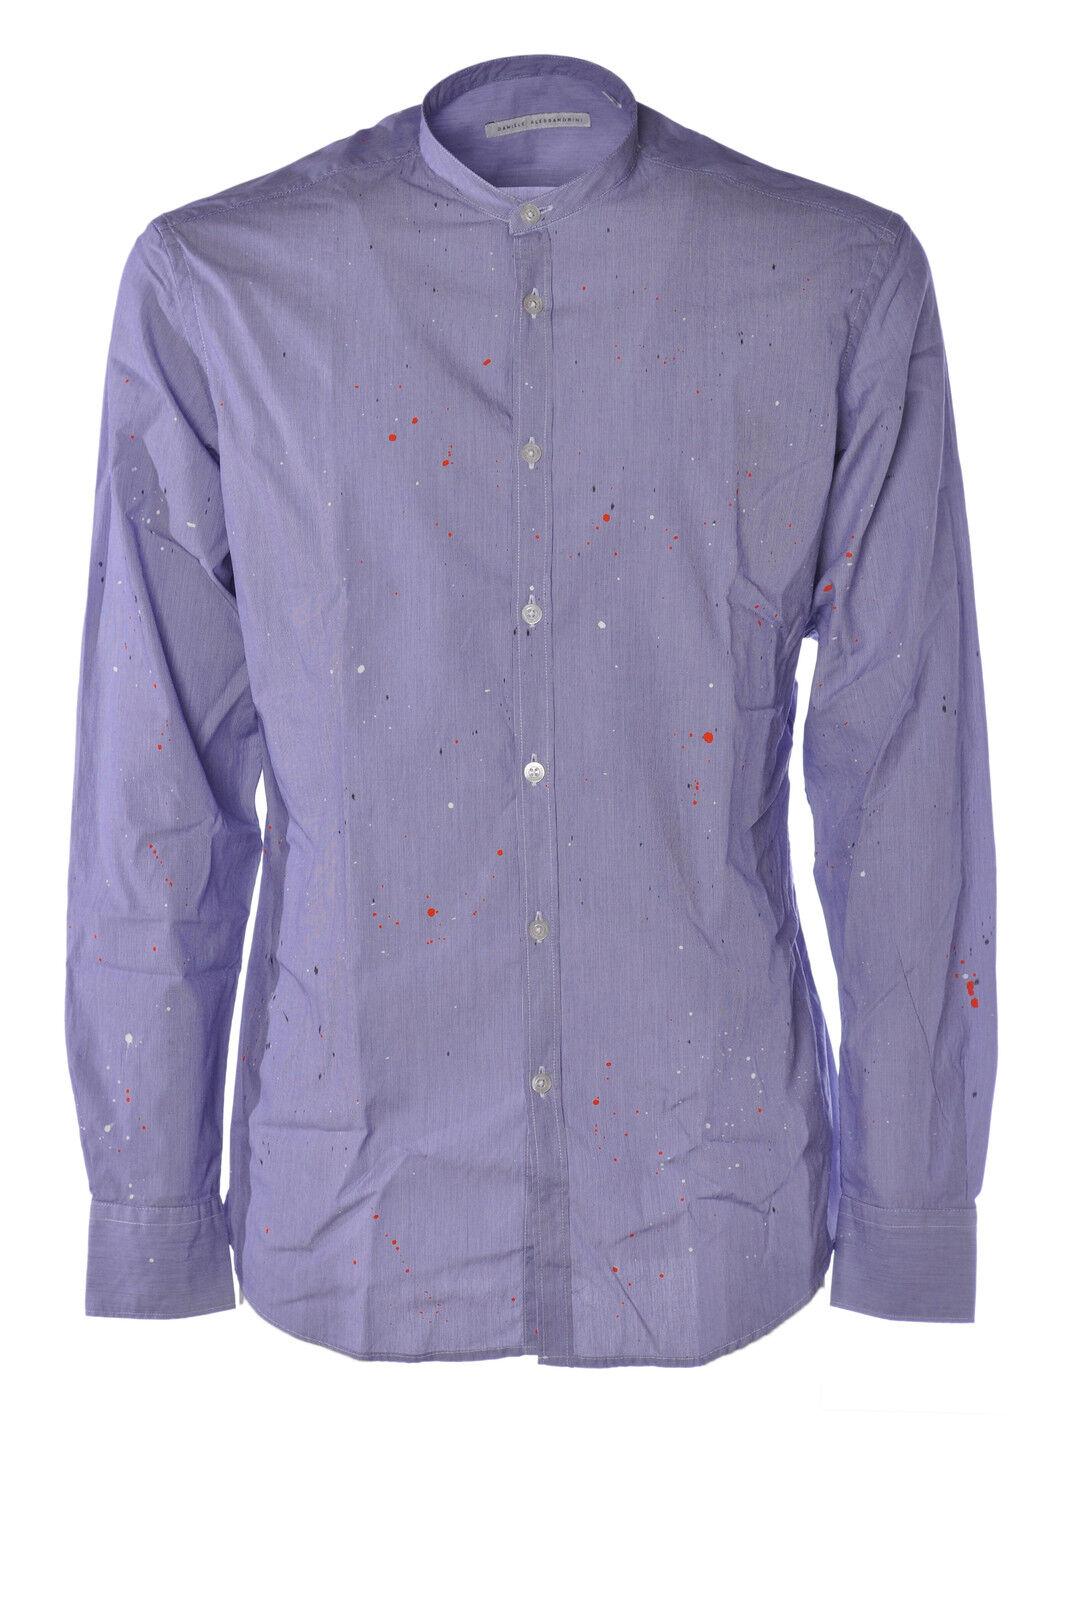 Daniele Alessandrini  -  Shirts - Male - 41 - Blau - 1736618C165143